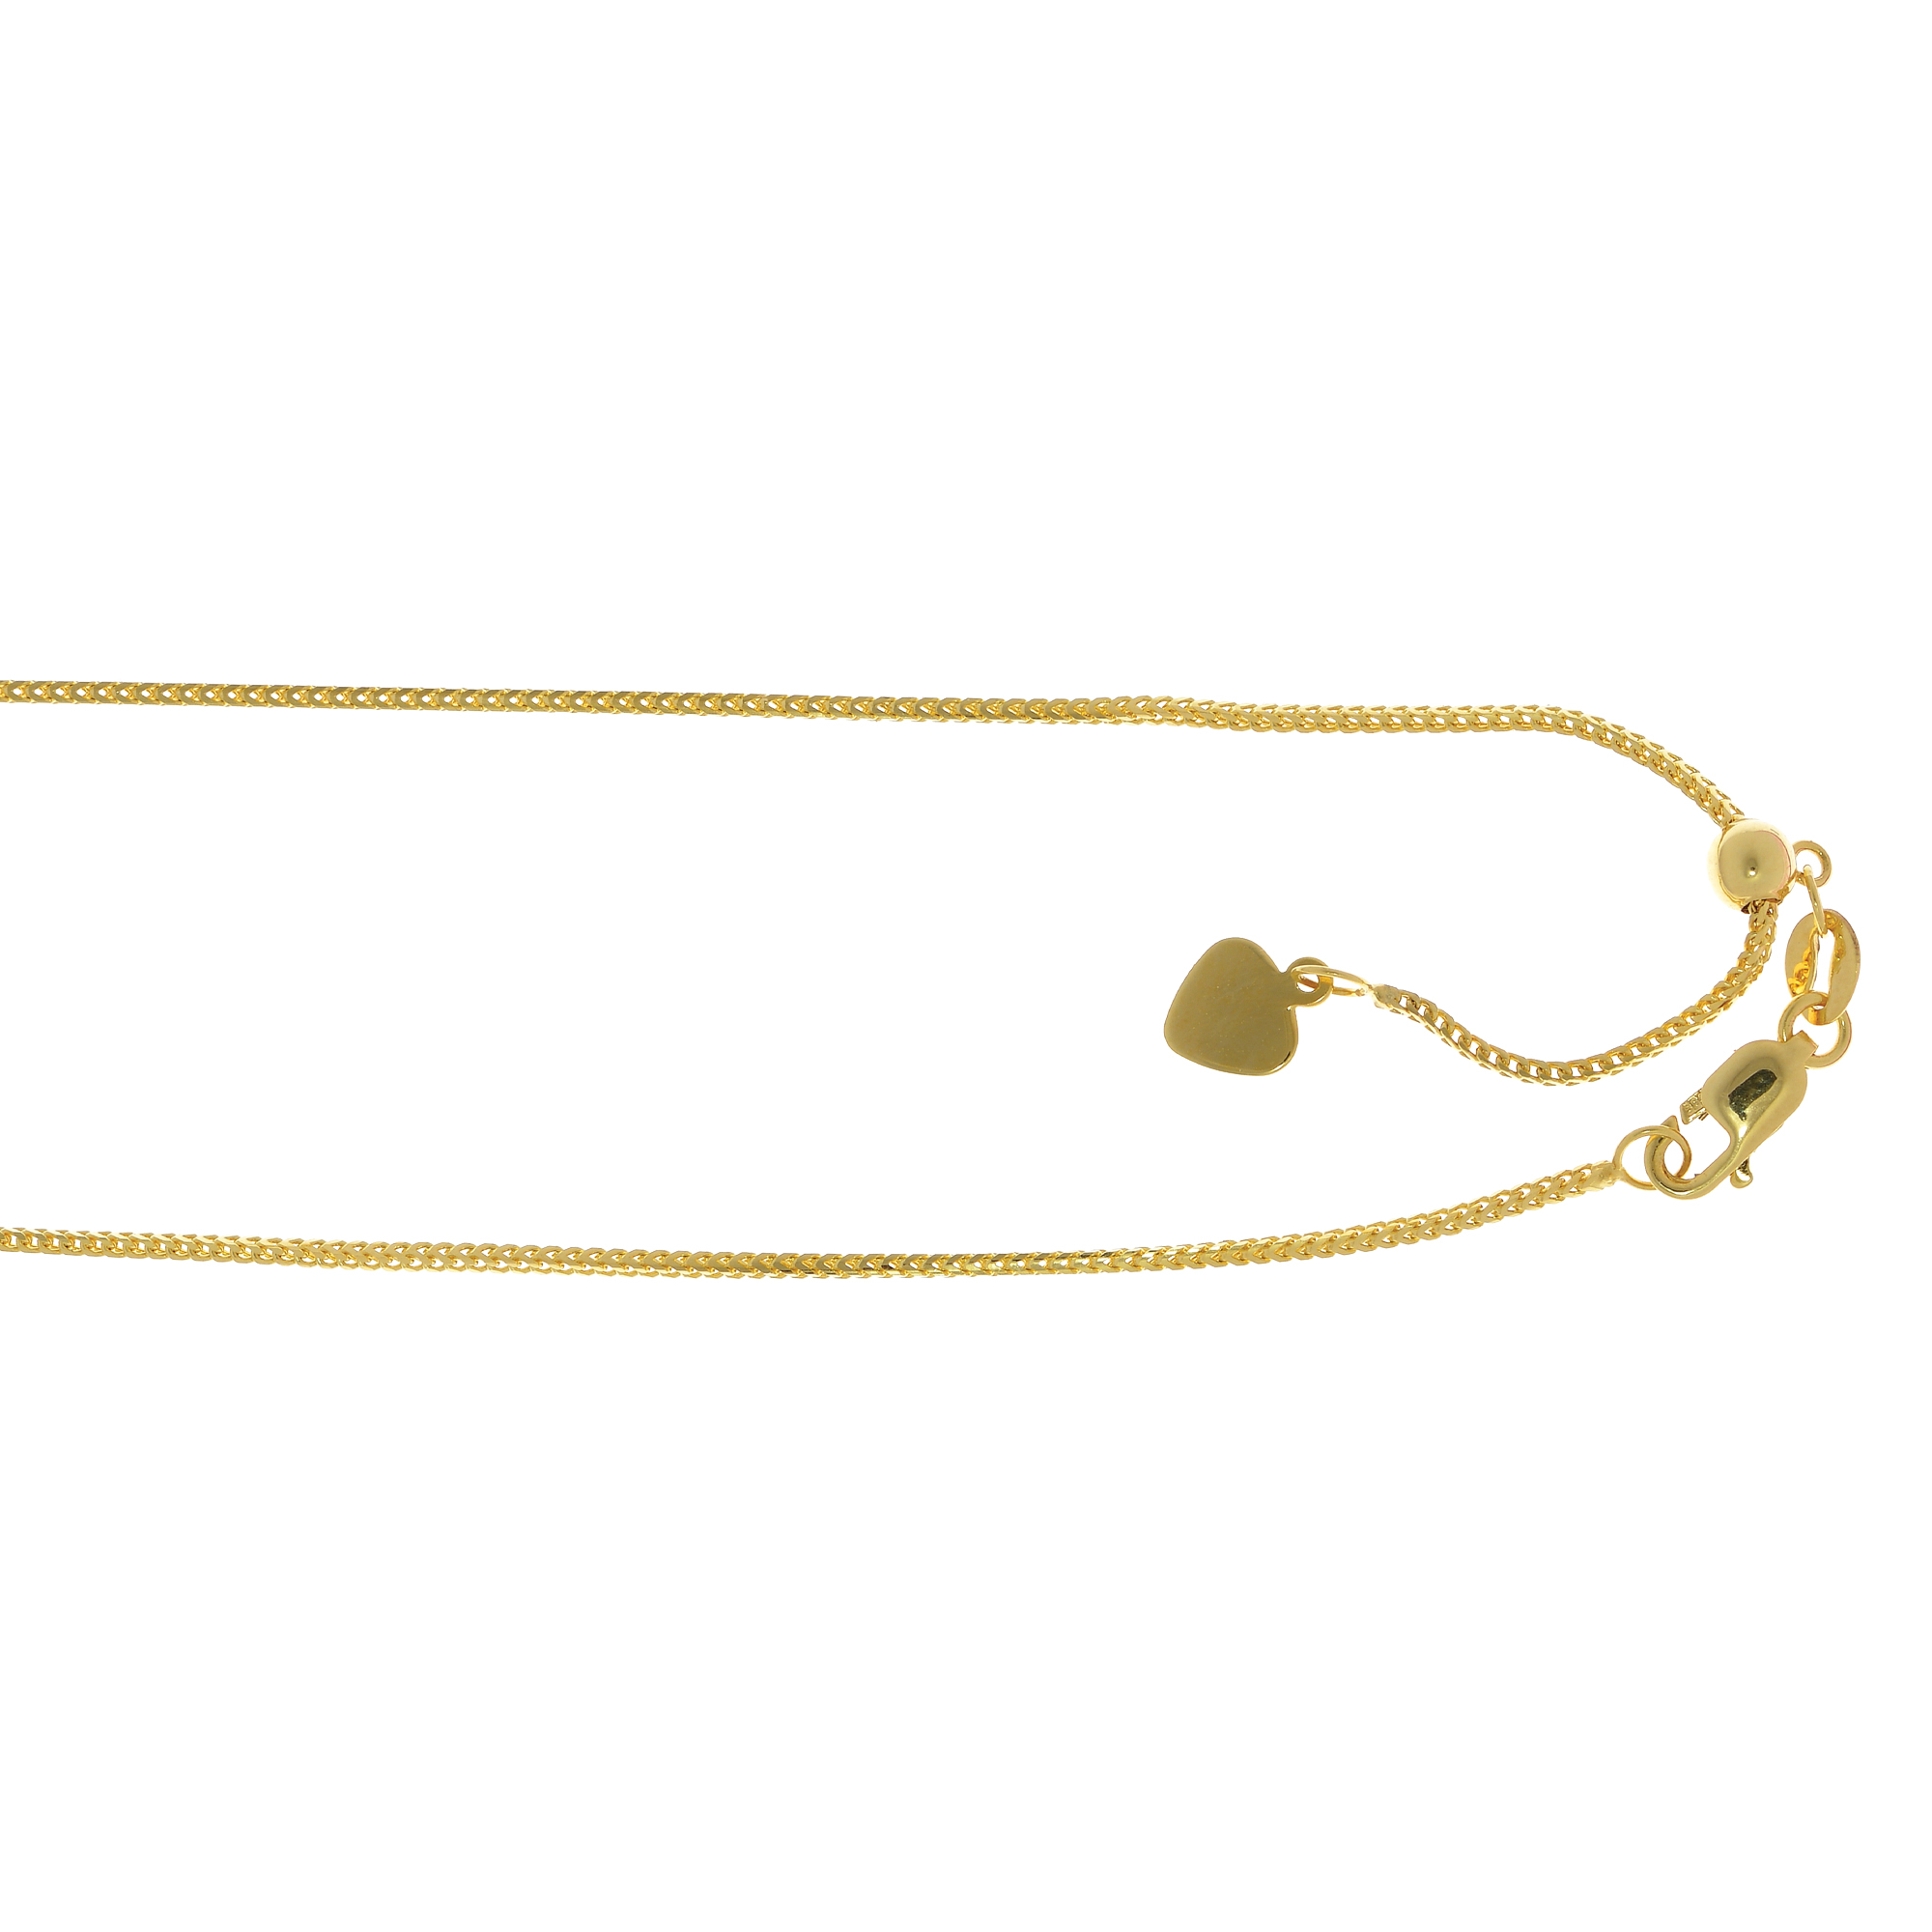 LUXURMAN Solid 14k Gold Franco Chain For Women Adjustable 0.9mm